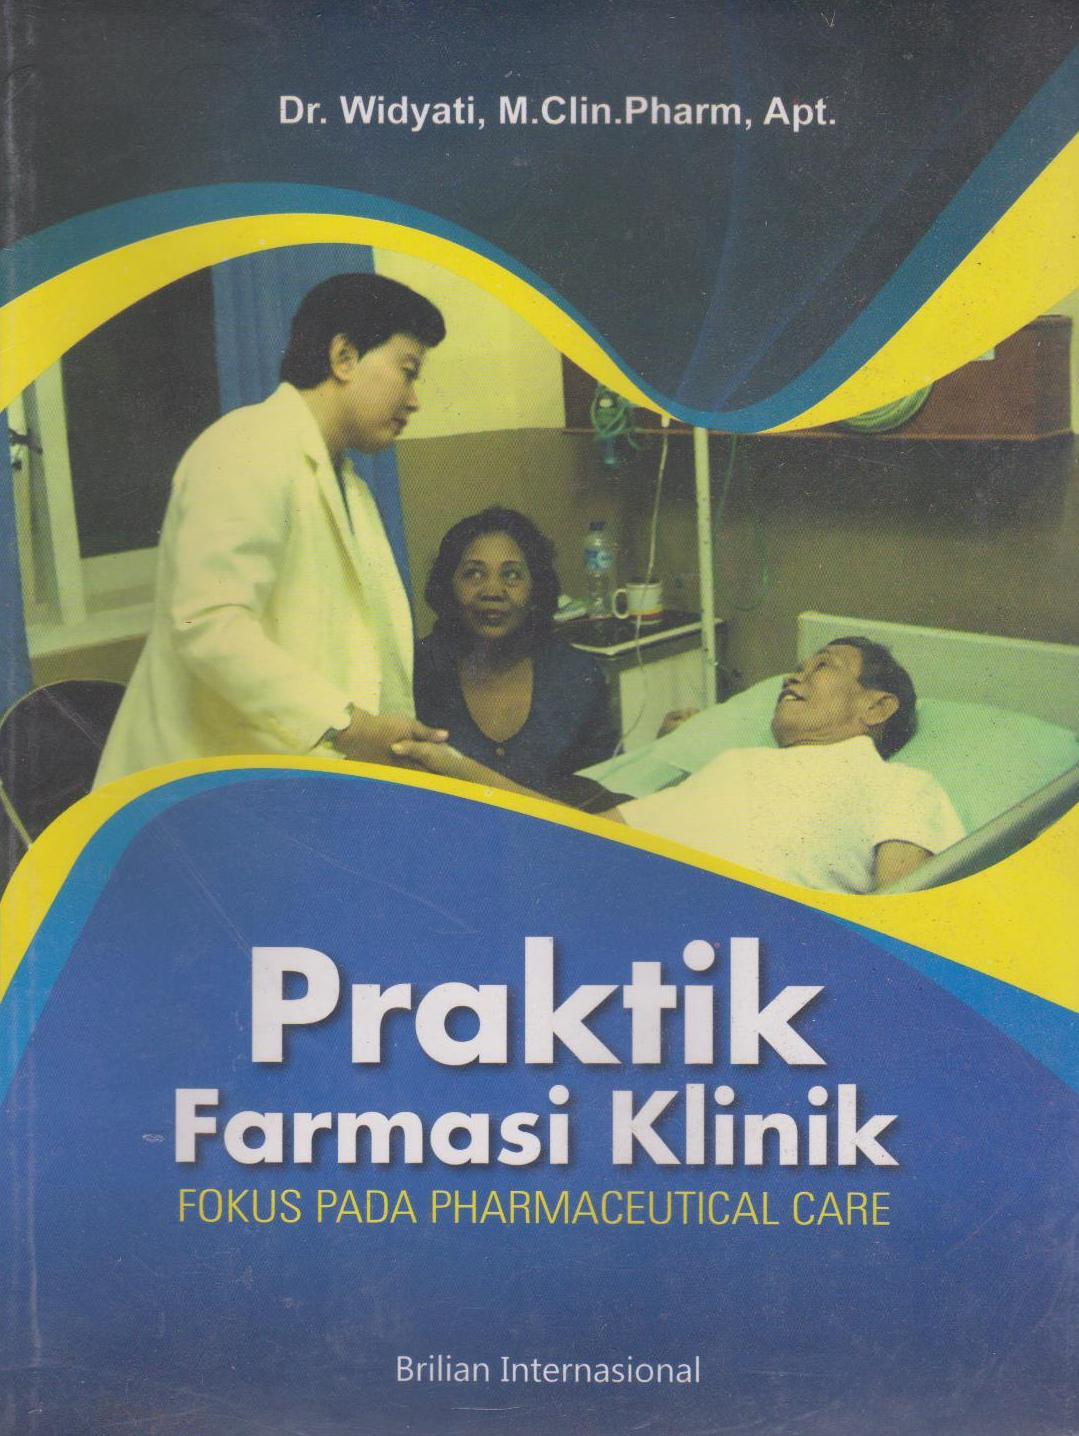 praktik farmasi klinik   fokus pada pharmaceutical care